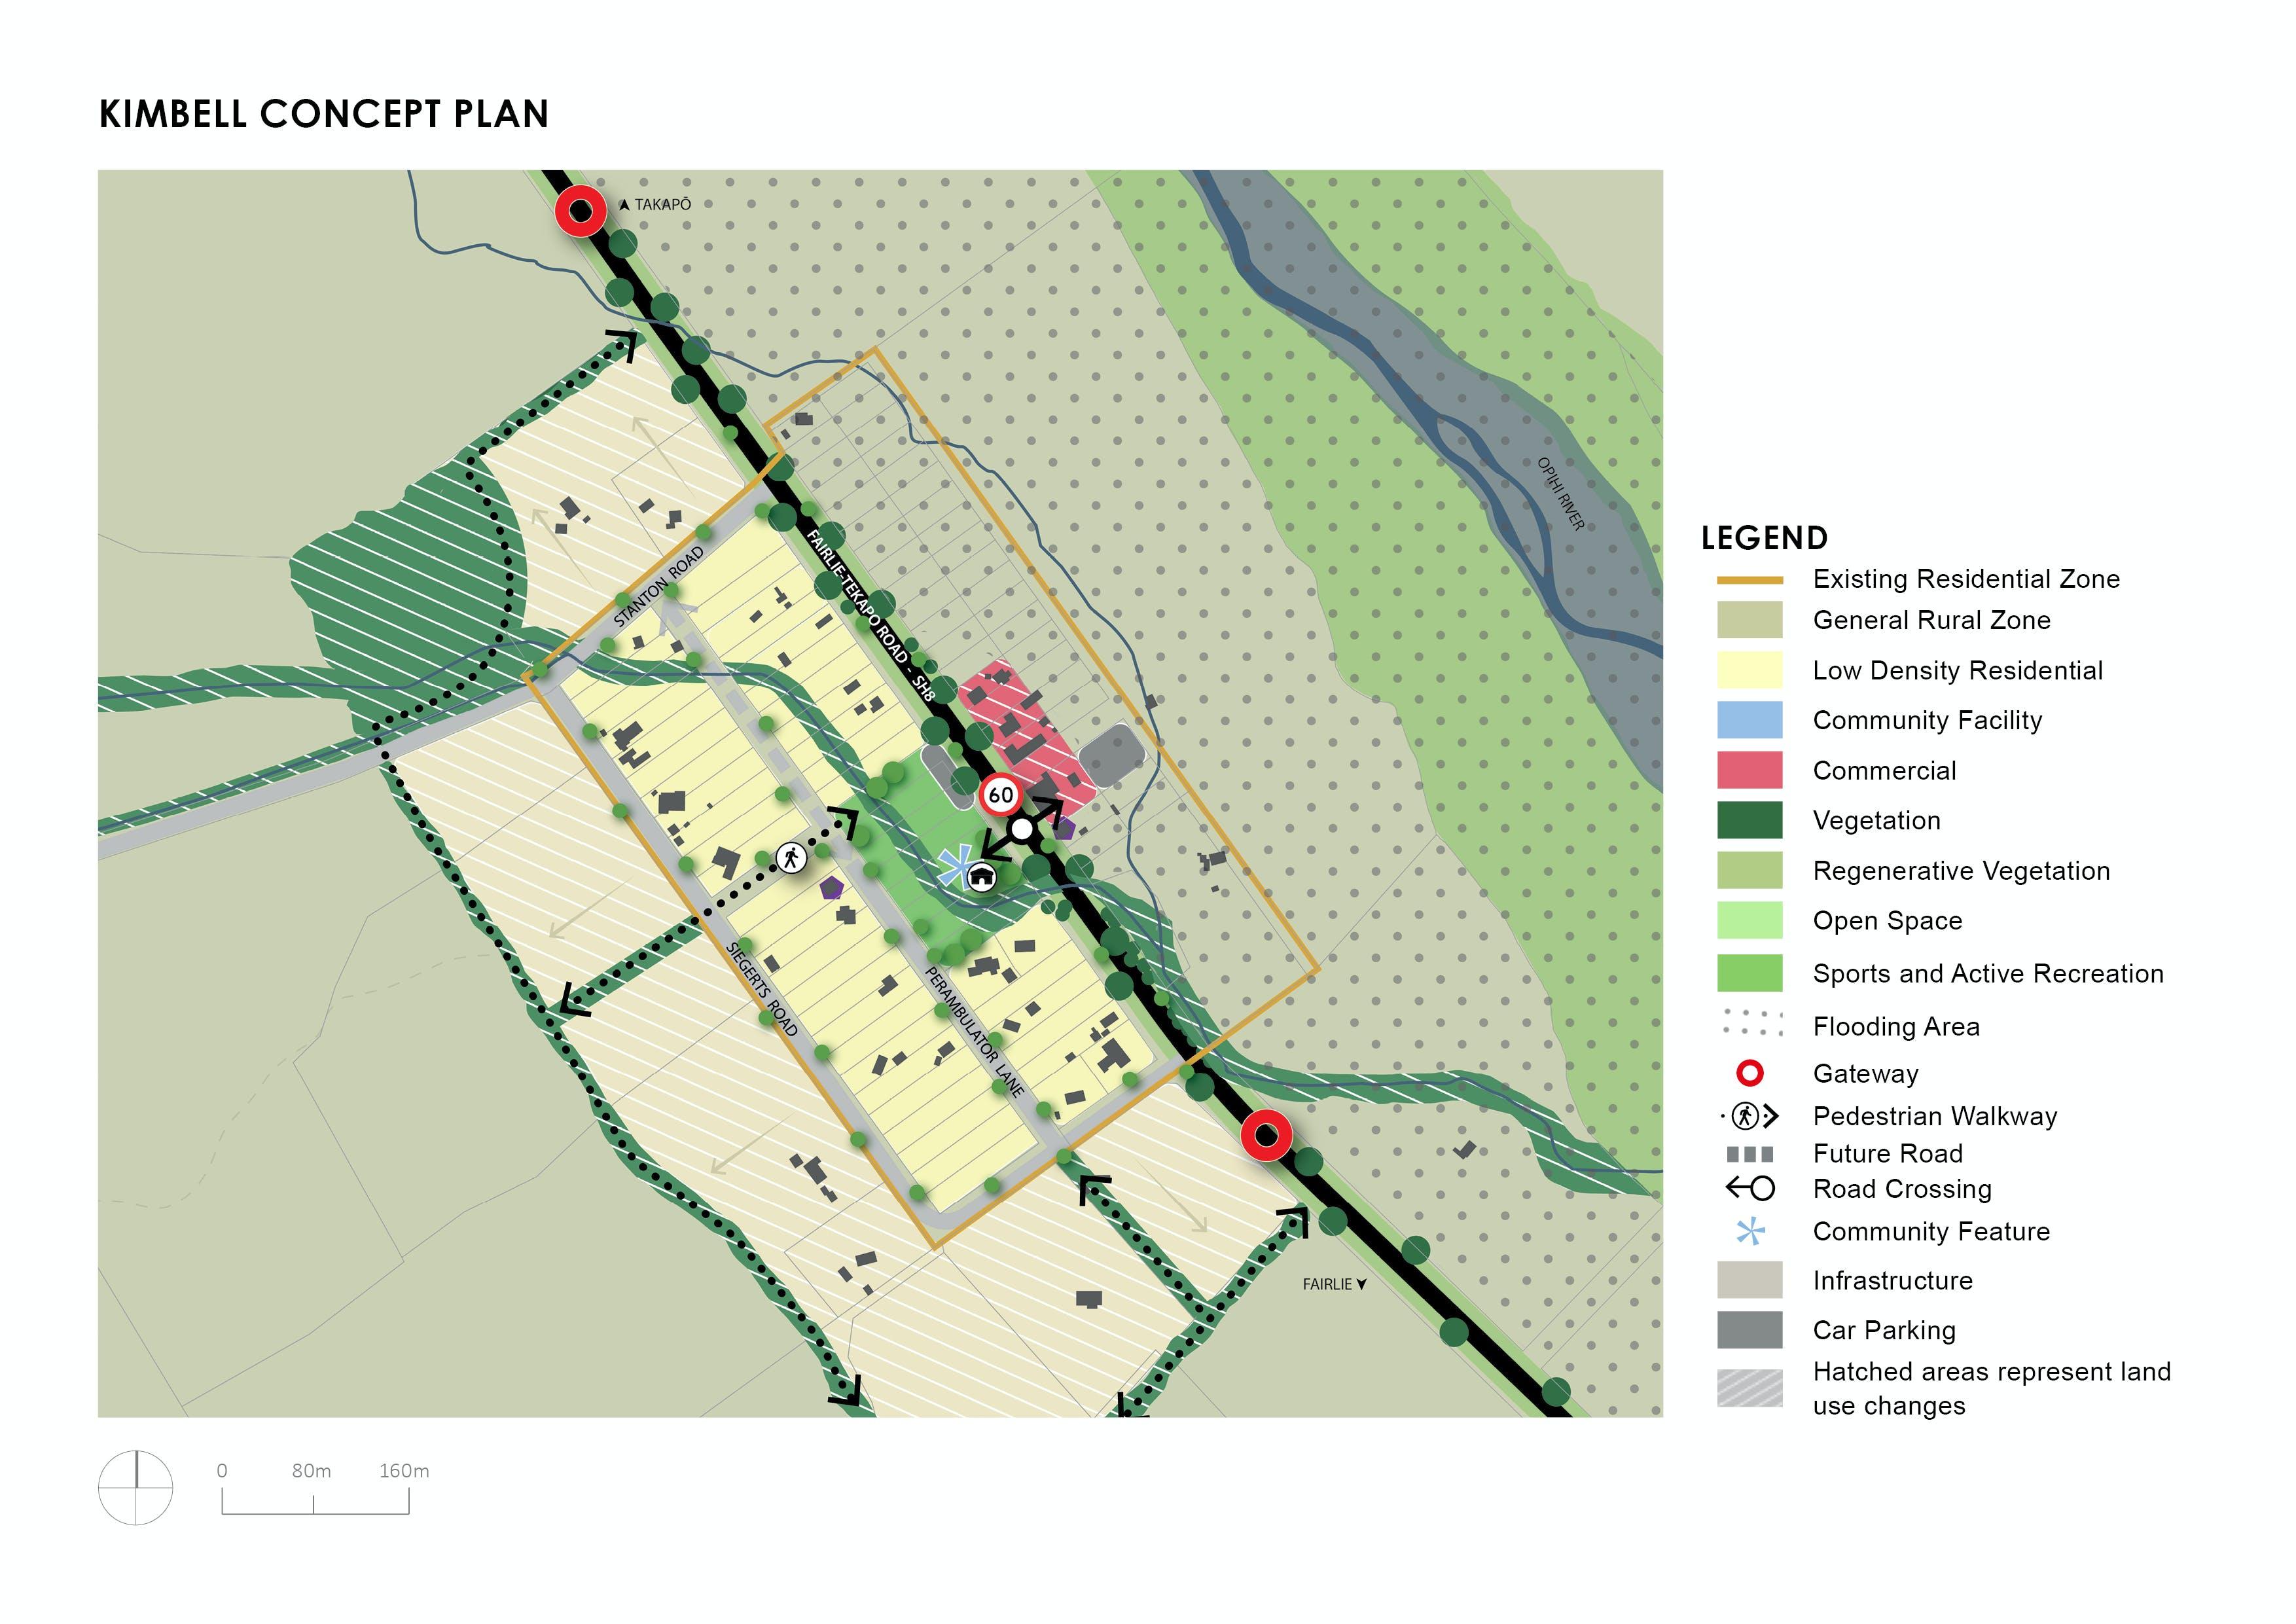 Kimbell Concept Plan